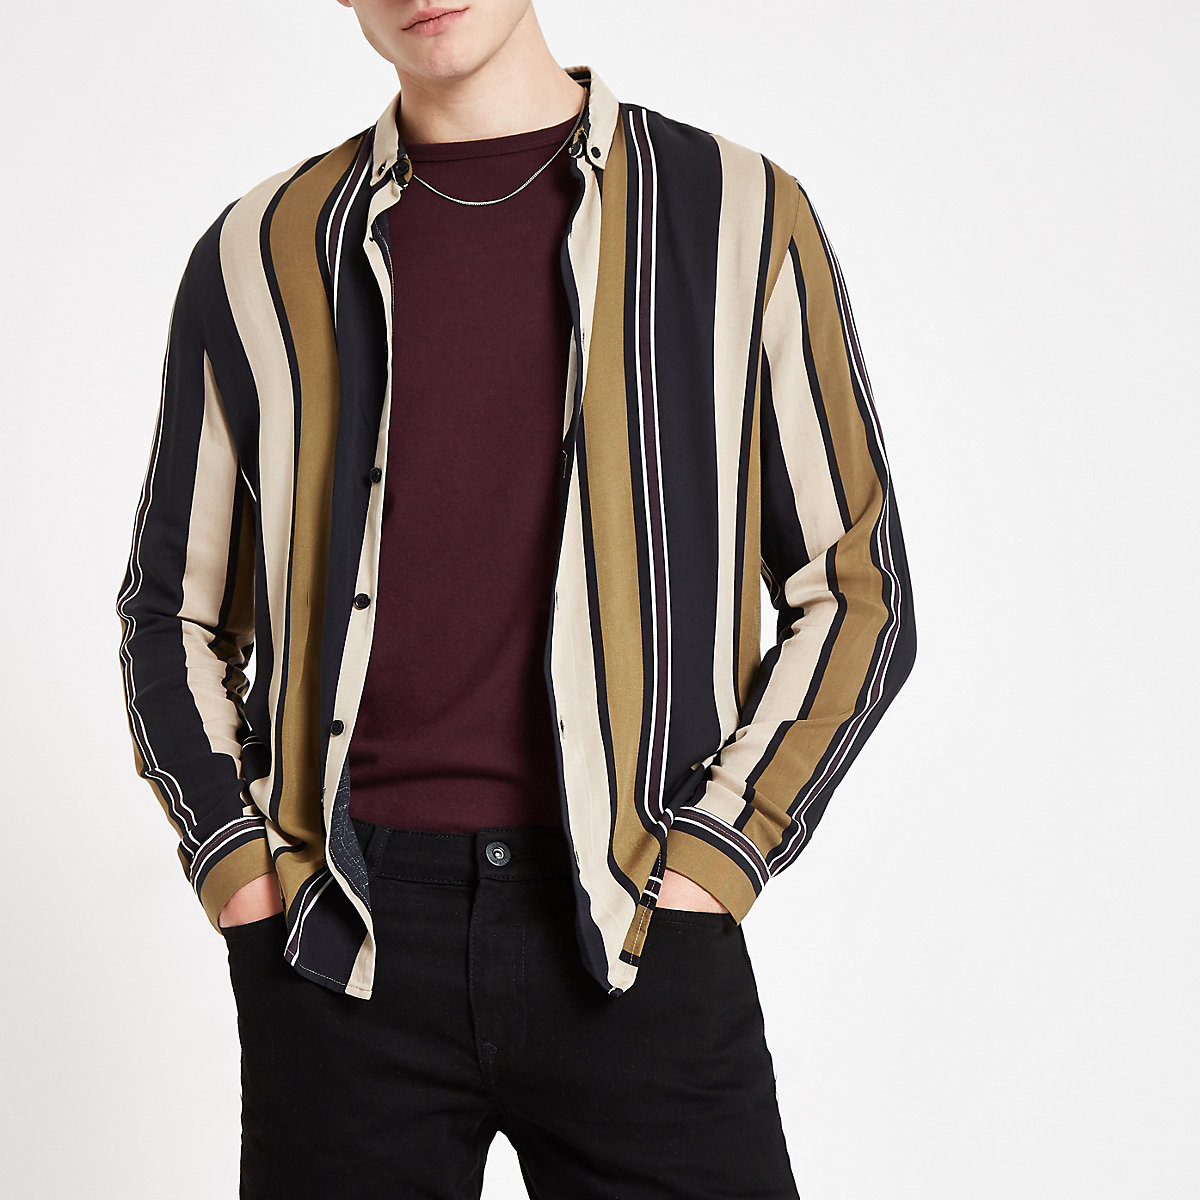 Stone and black stripe long sleeve shirt